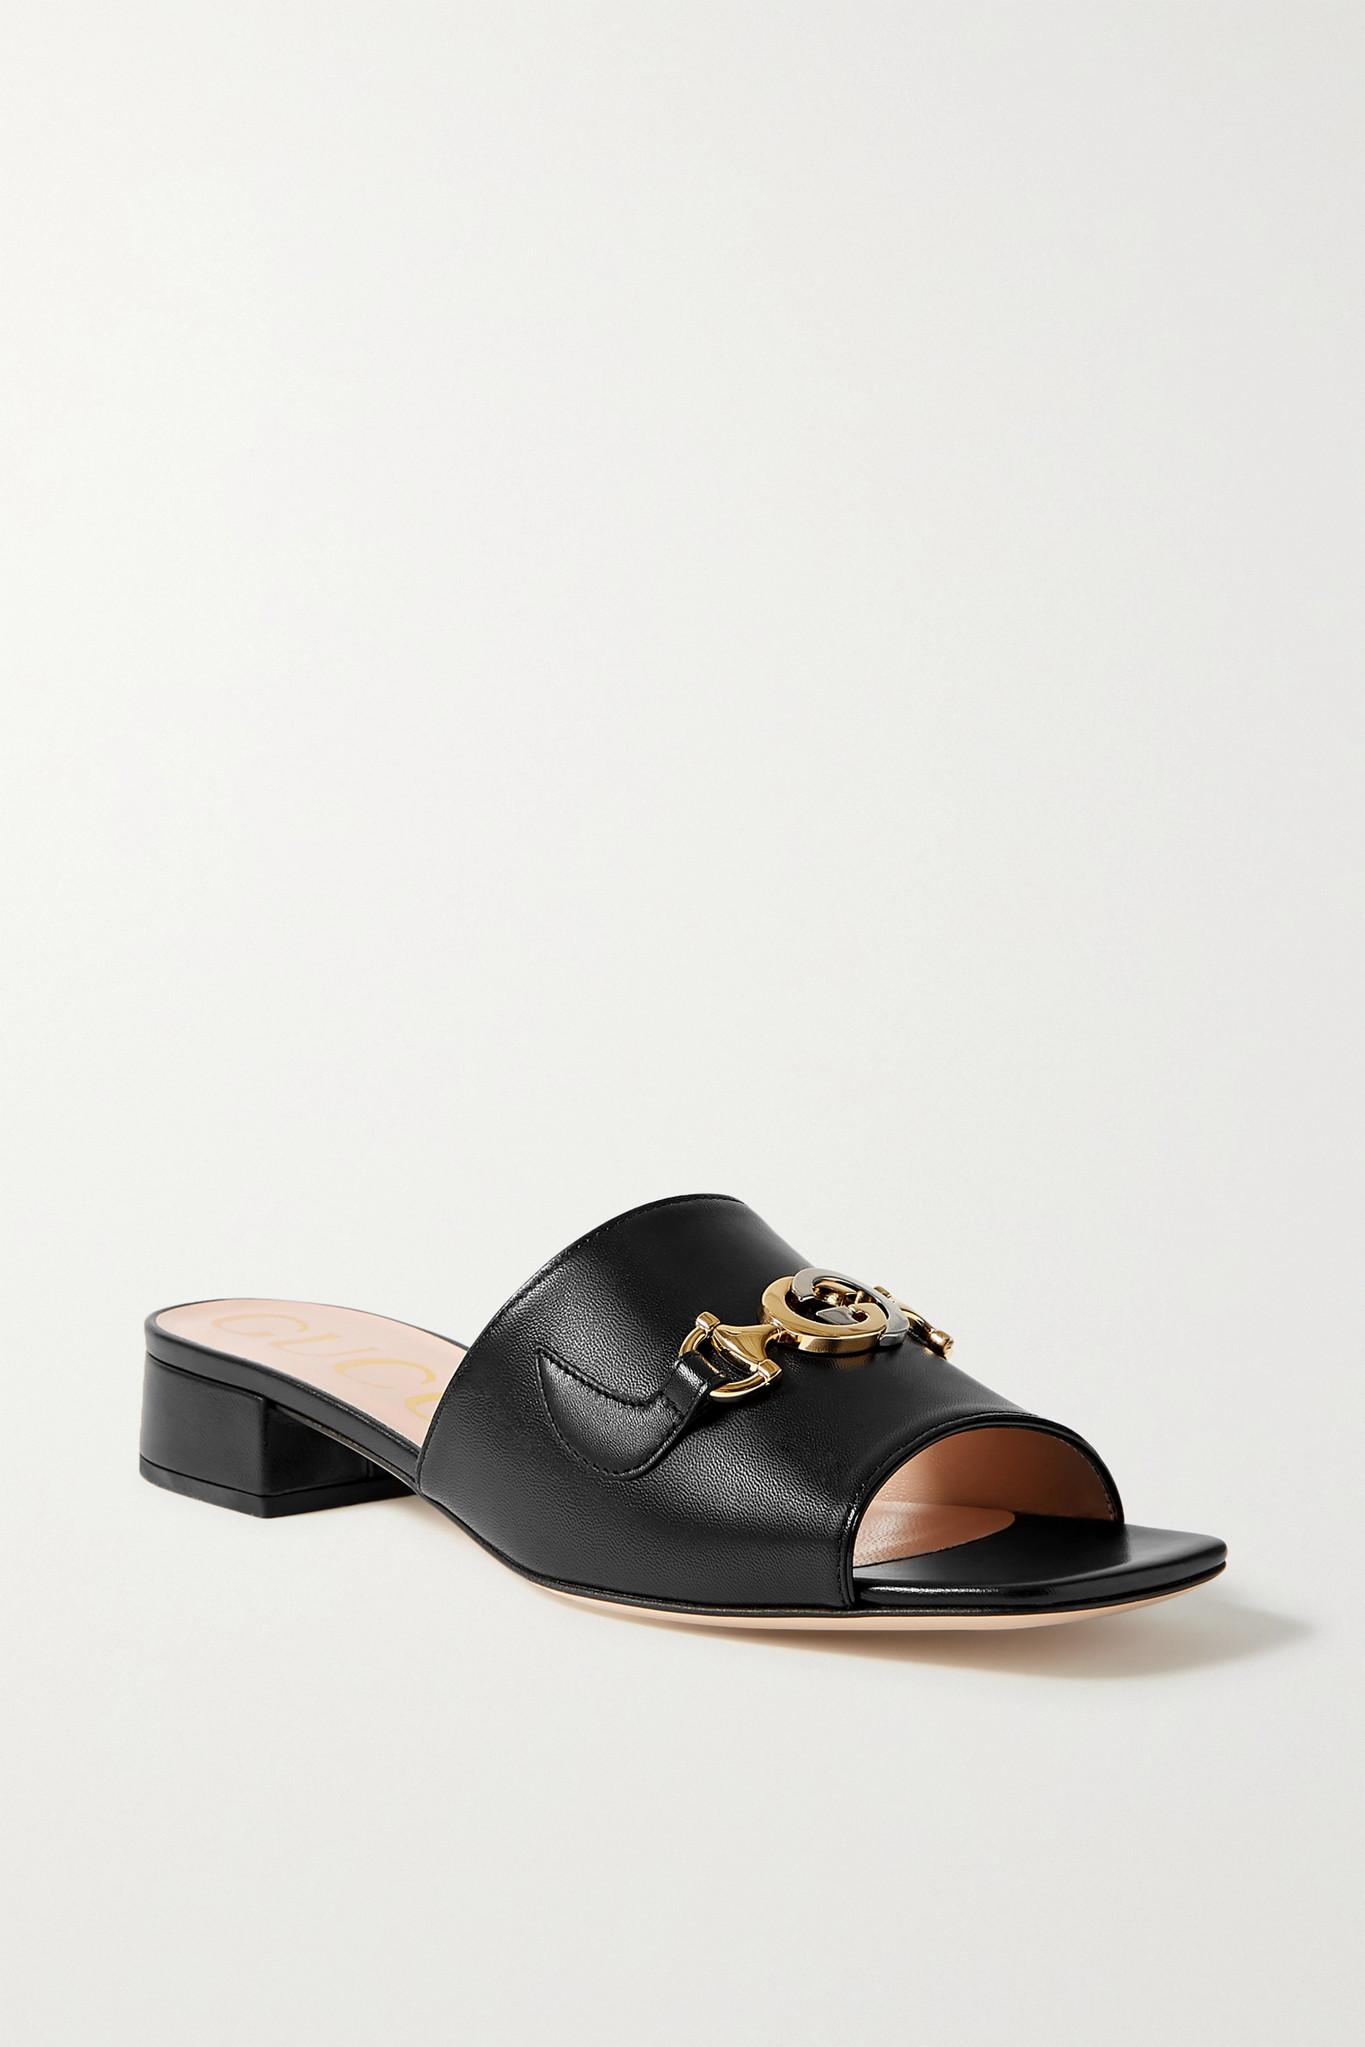 GUCCI - Zumi Embellished Leather Mules - Black - IT34